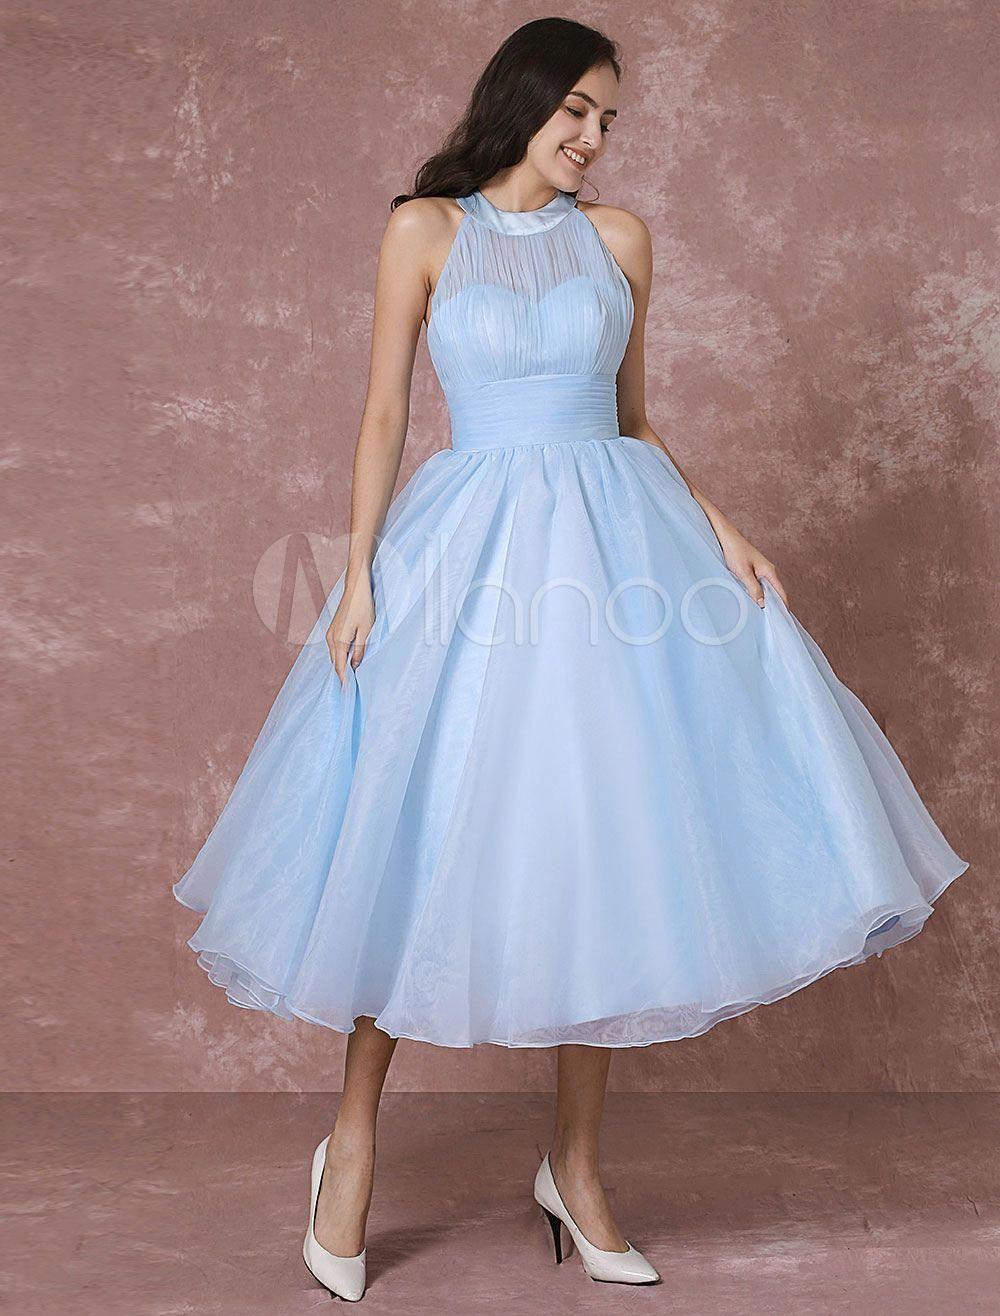 Blue Wedding Dress Short Tulle Vintage Bridal Dress Halter Backless Ball Gown Cocktail Dress Tea-length Party Dress Milanoo #cocktailweddingdress #backlesscocktaildress